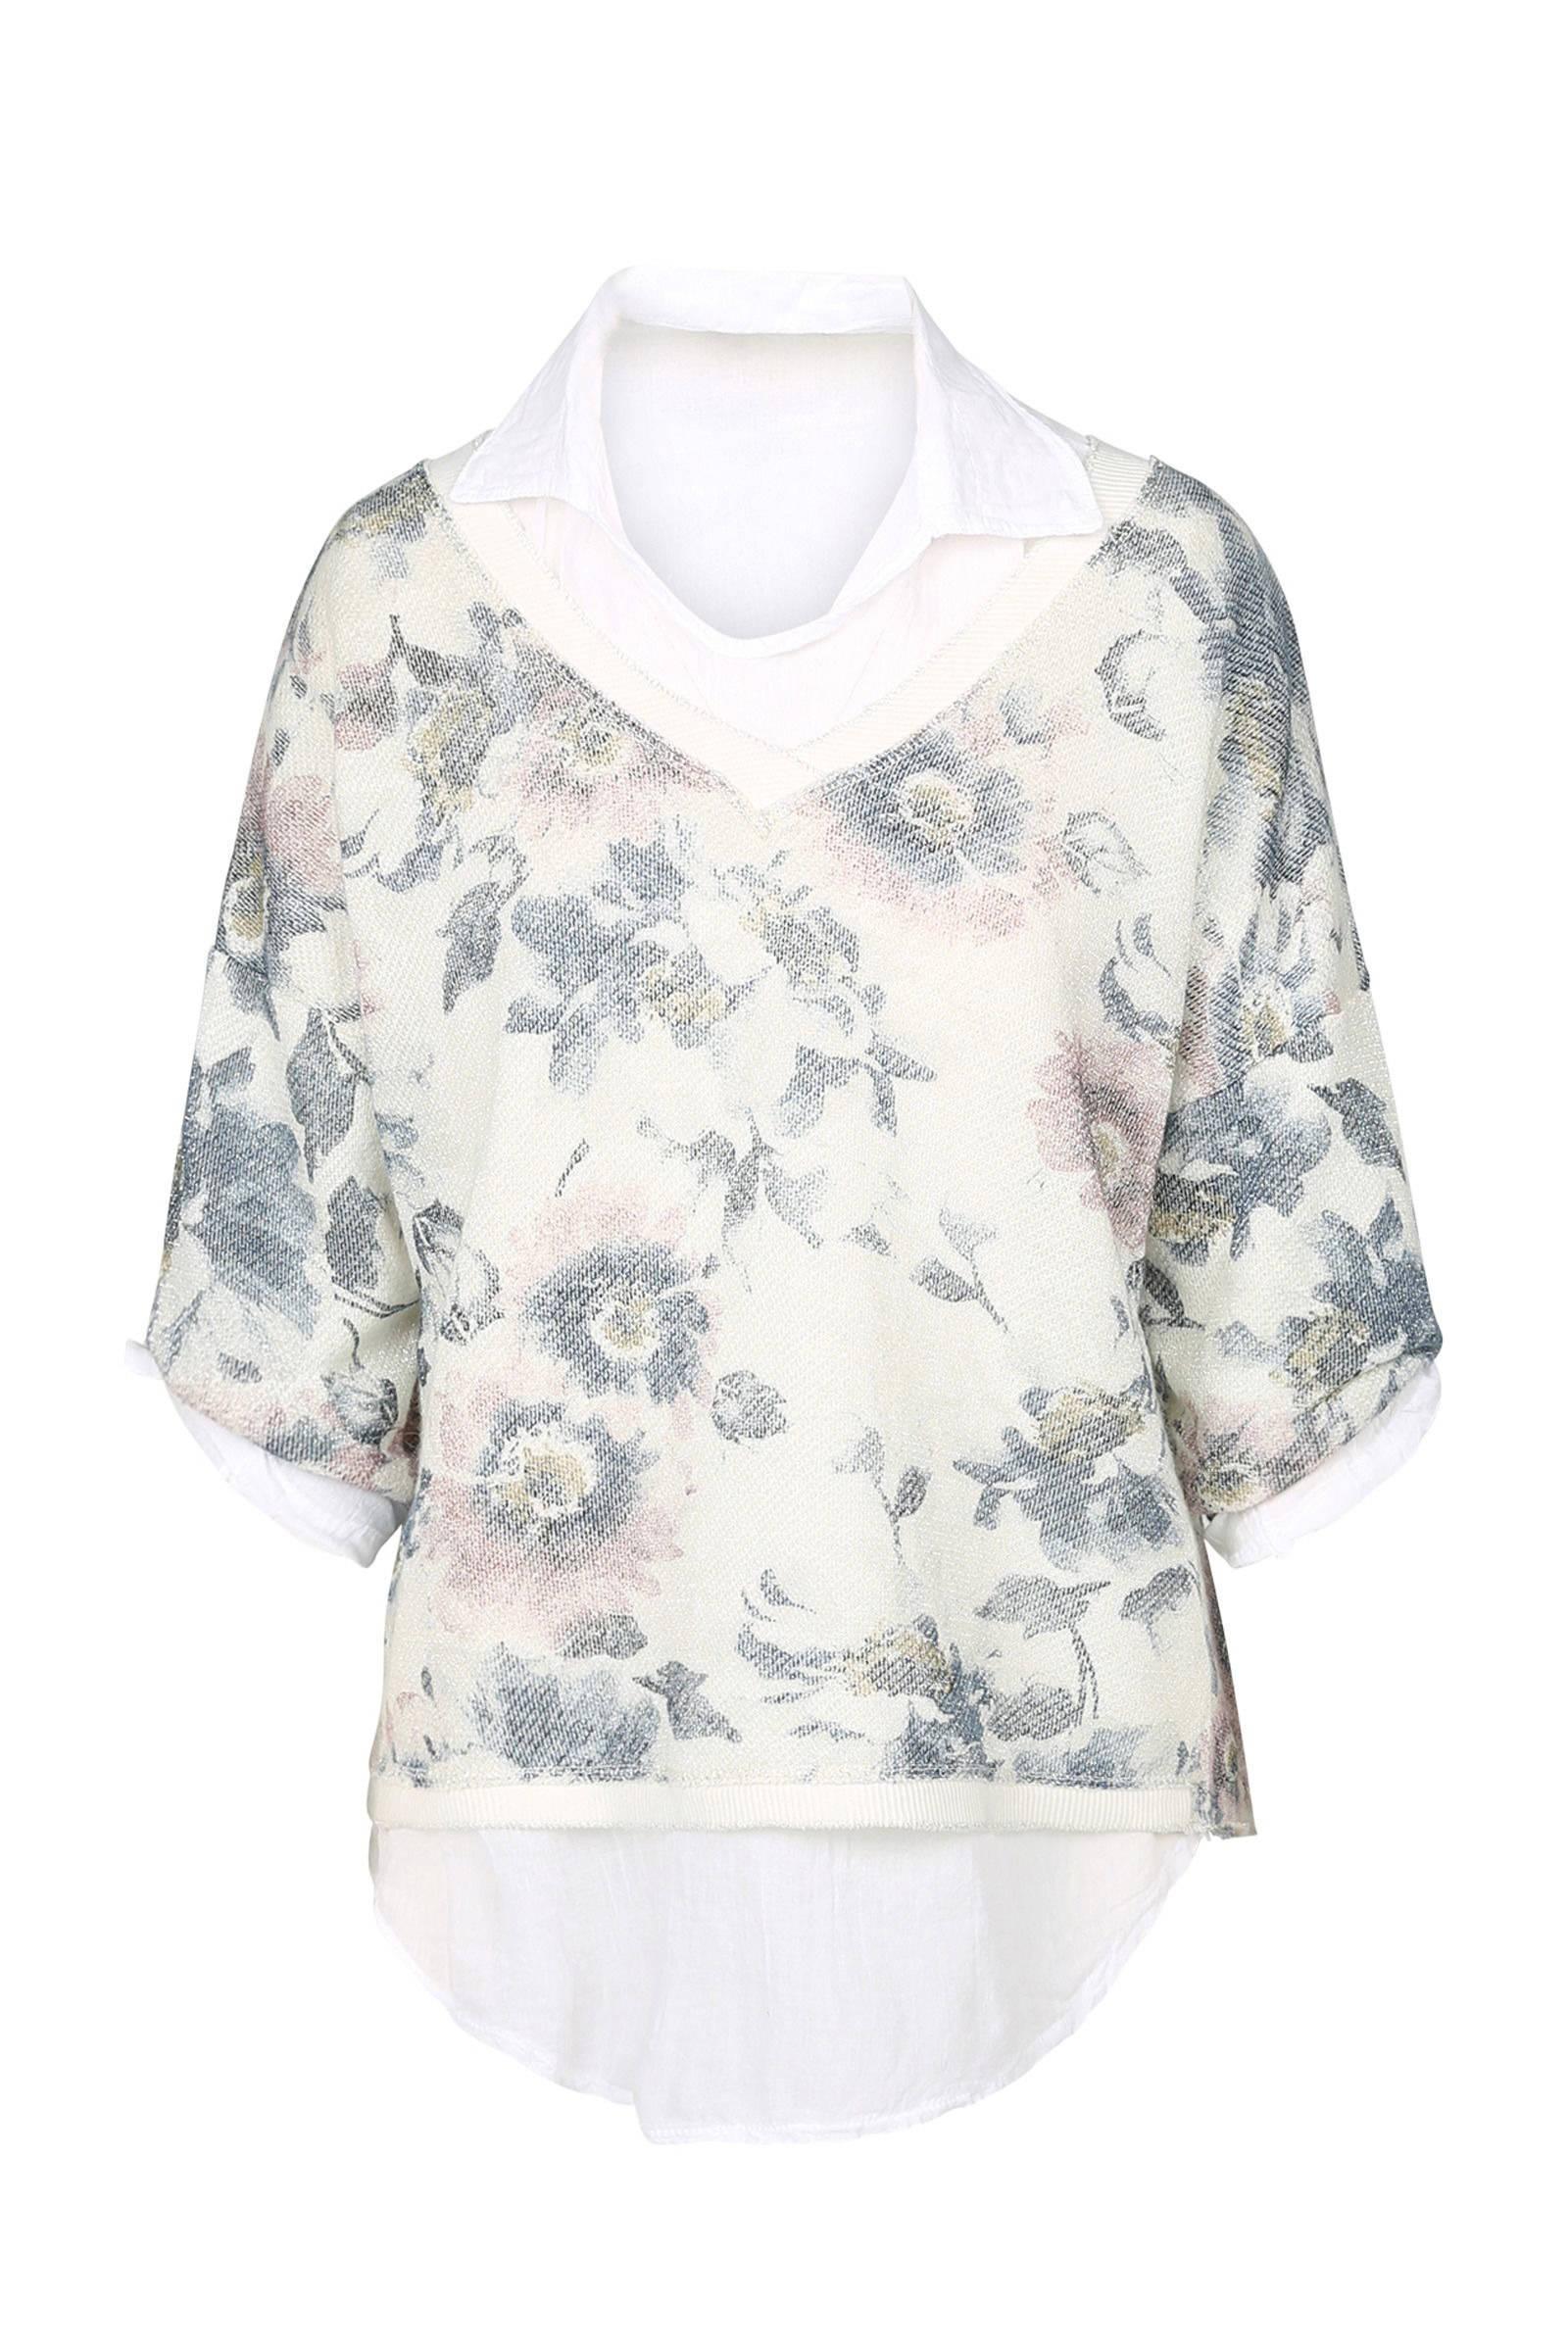 sweater bloemenprint dames